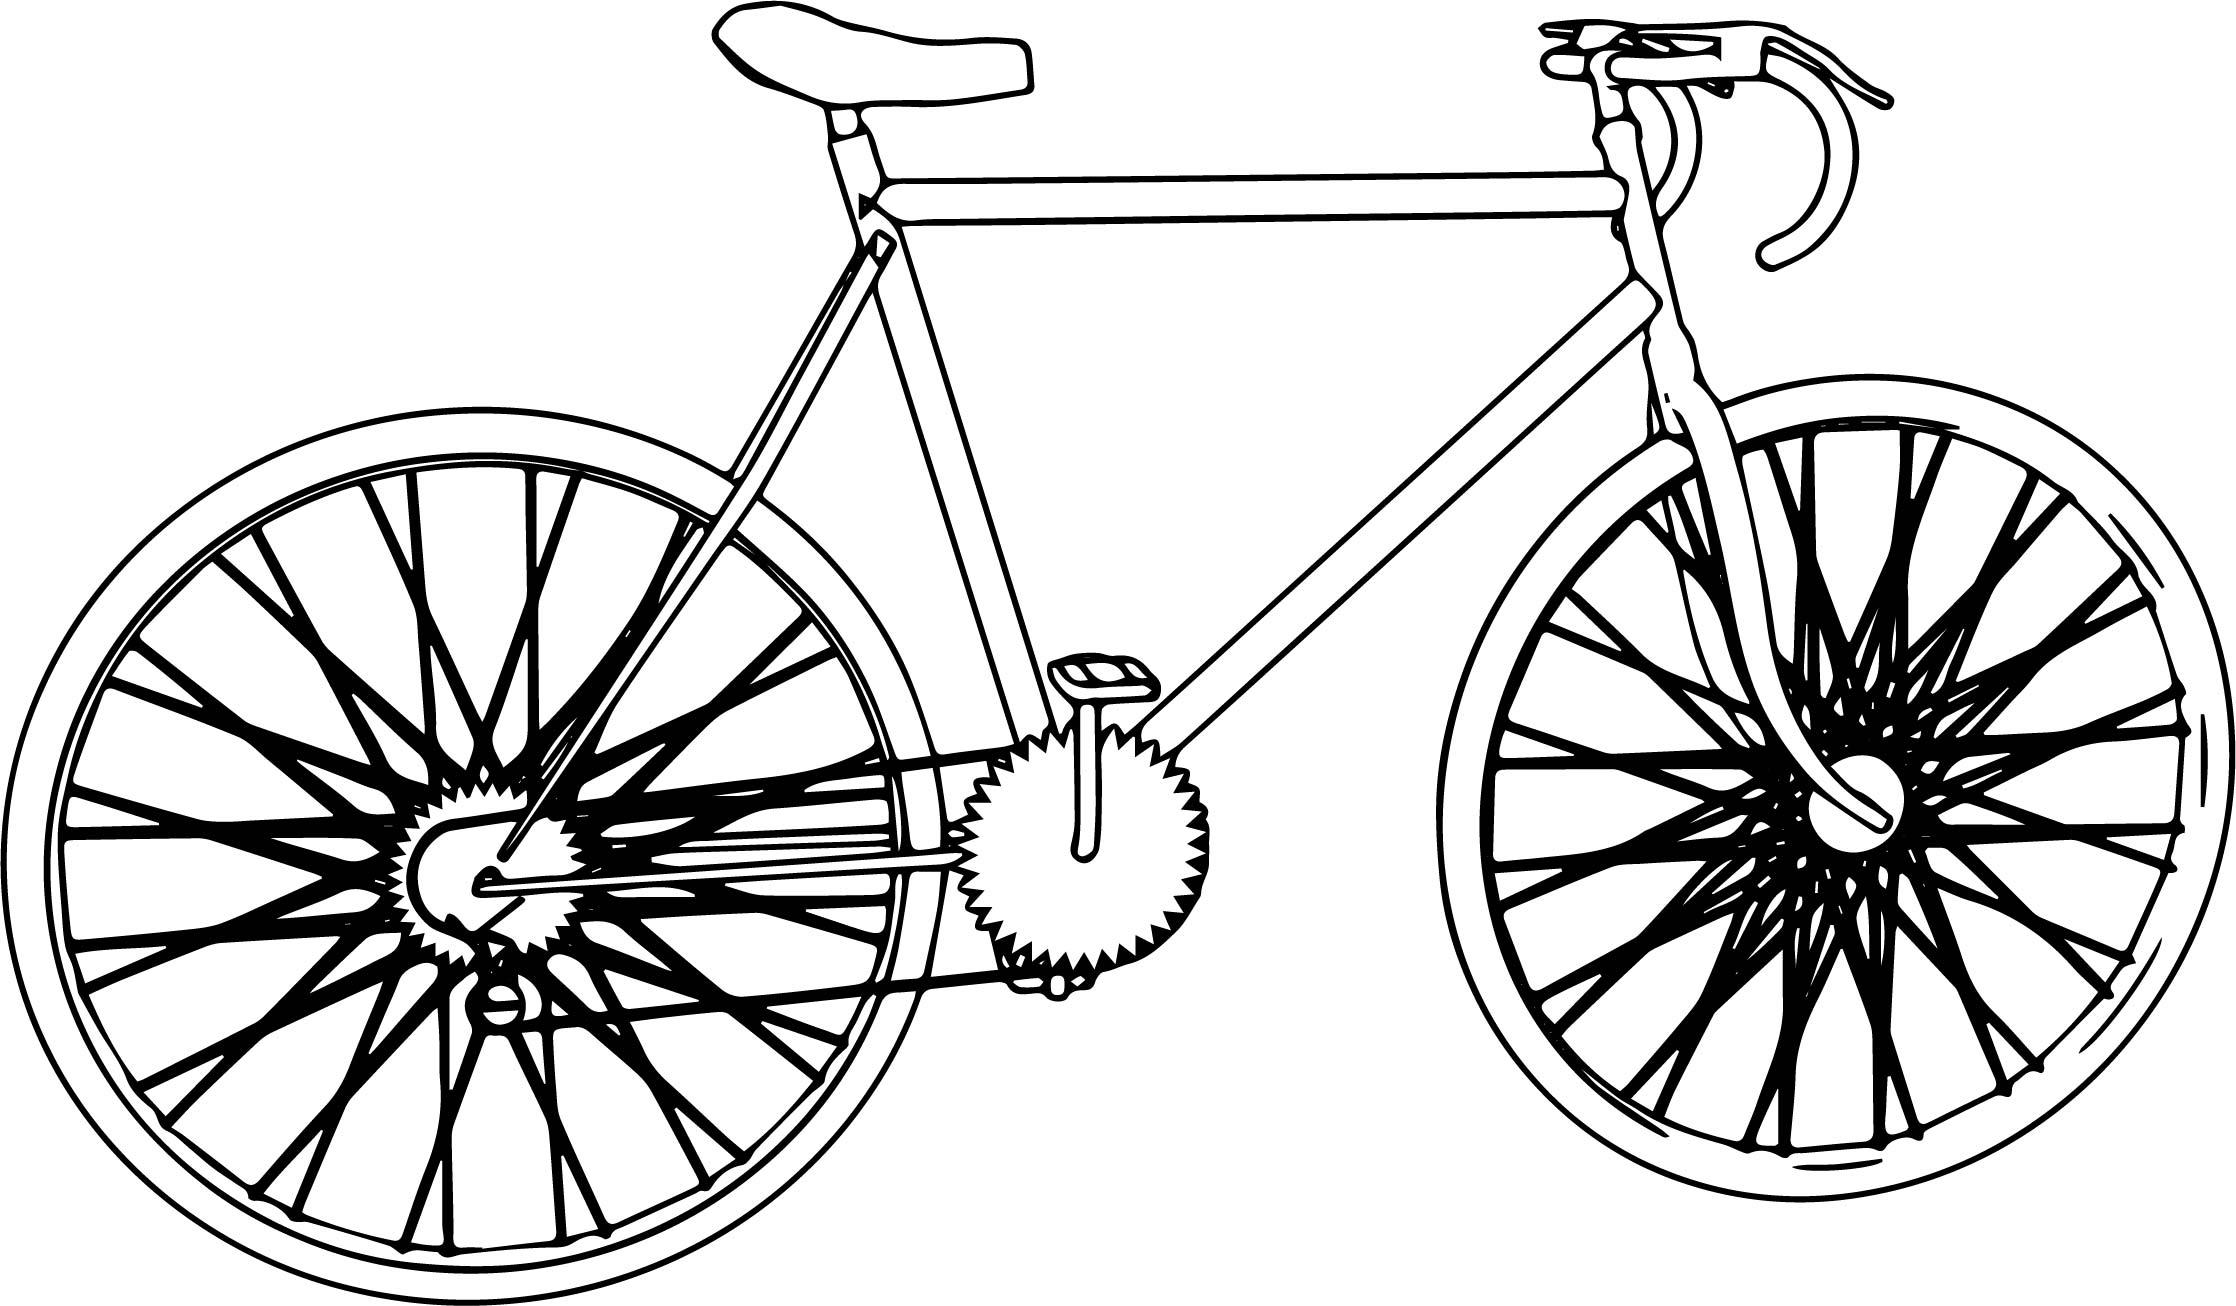 Biycle Coloring Page Sheet